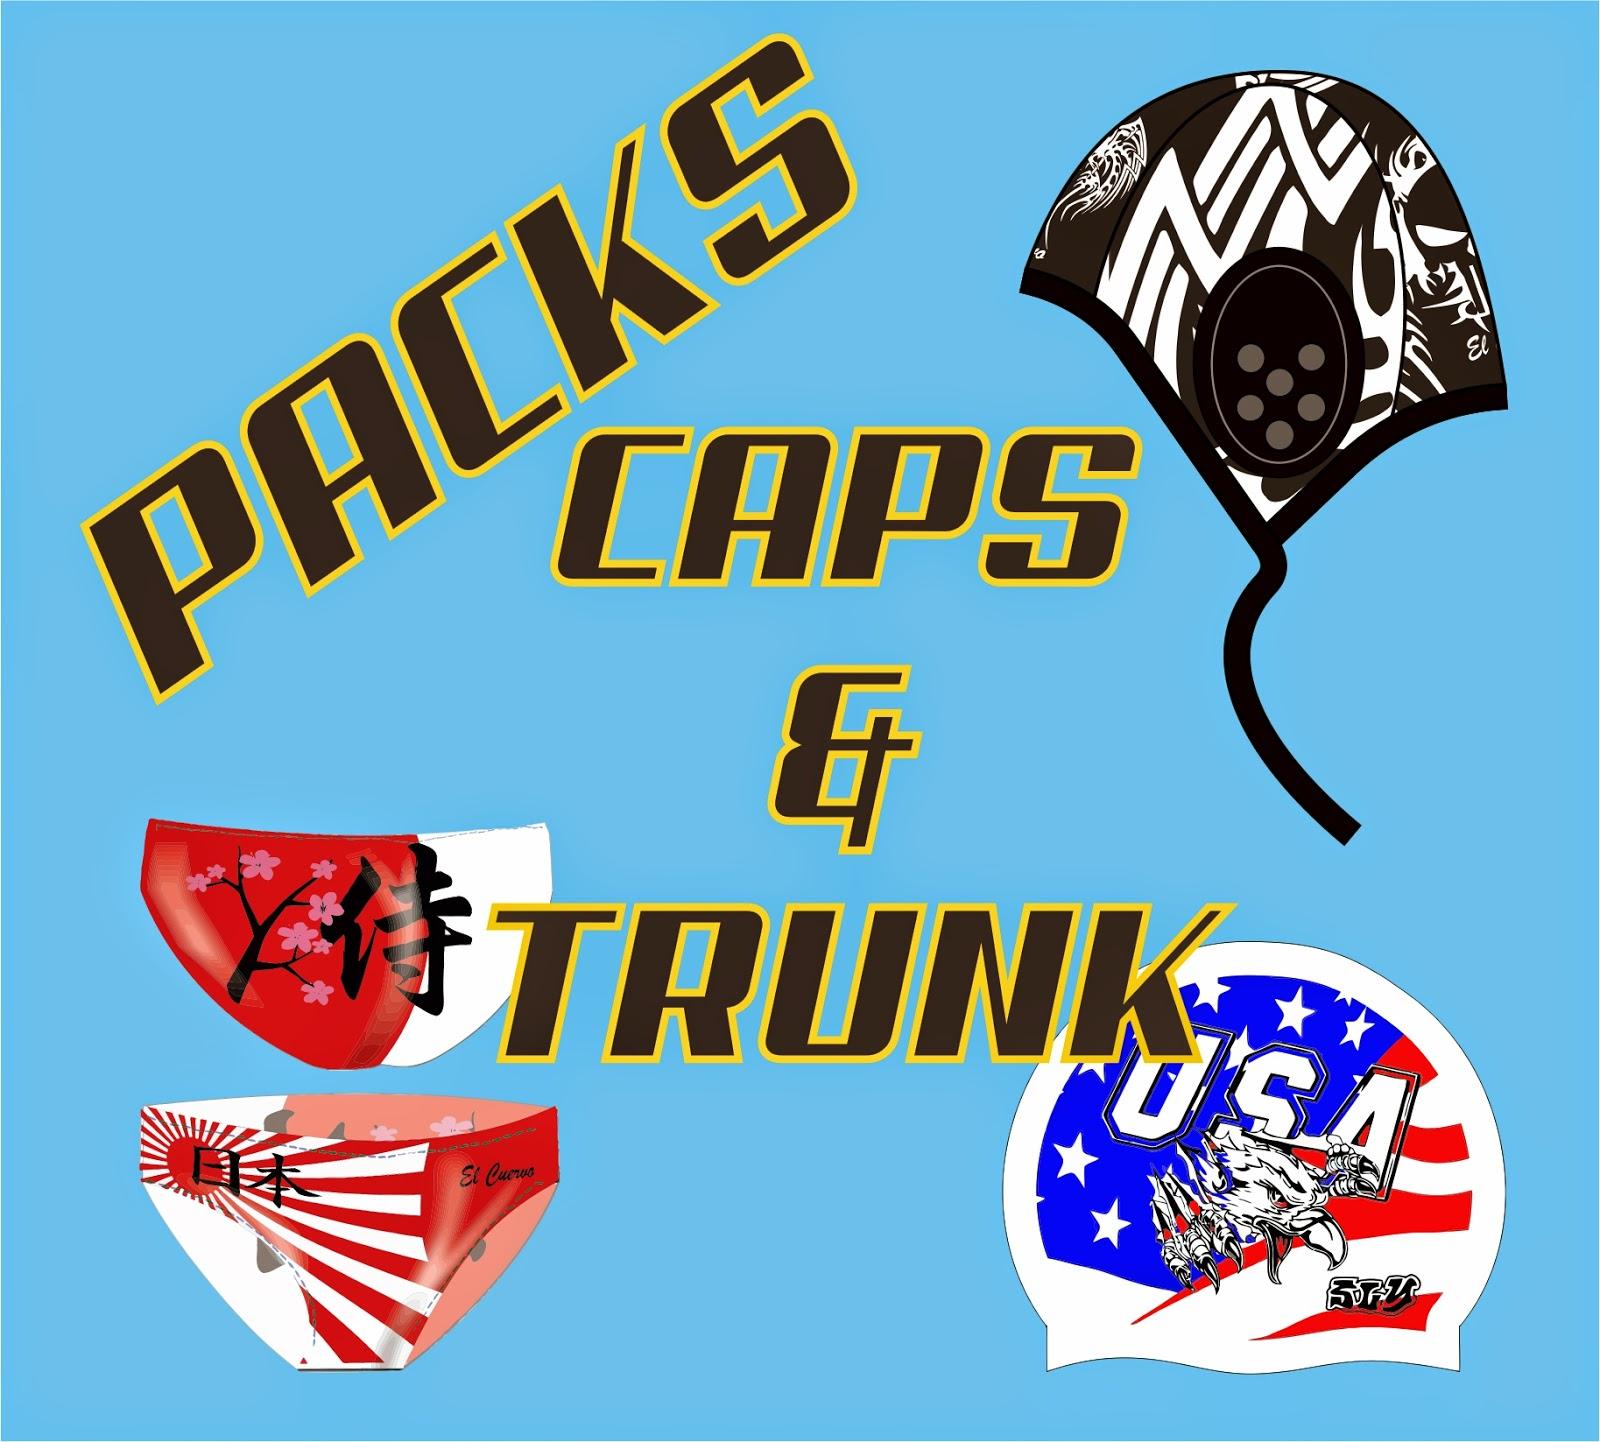 http://www.elcuervosports.com/elcuervowptheshop/c280922/packs-caps-trunks.html